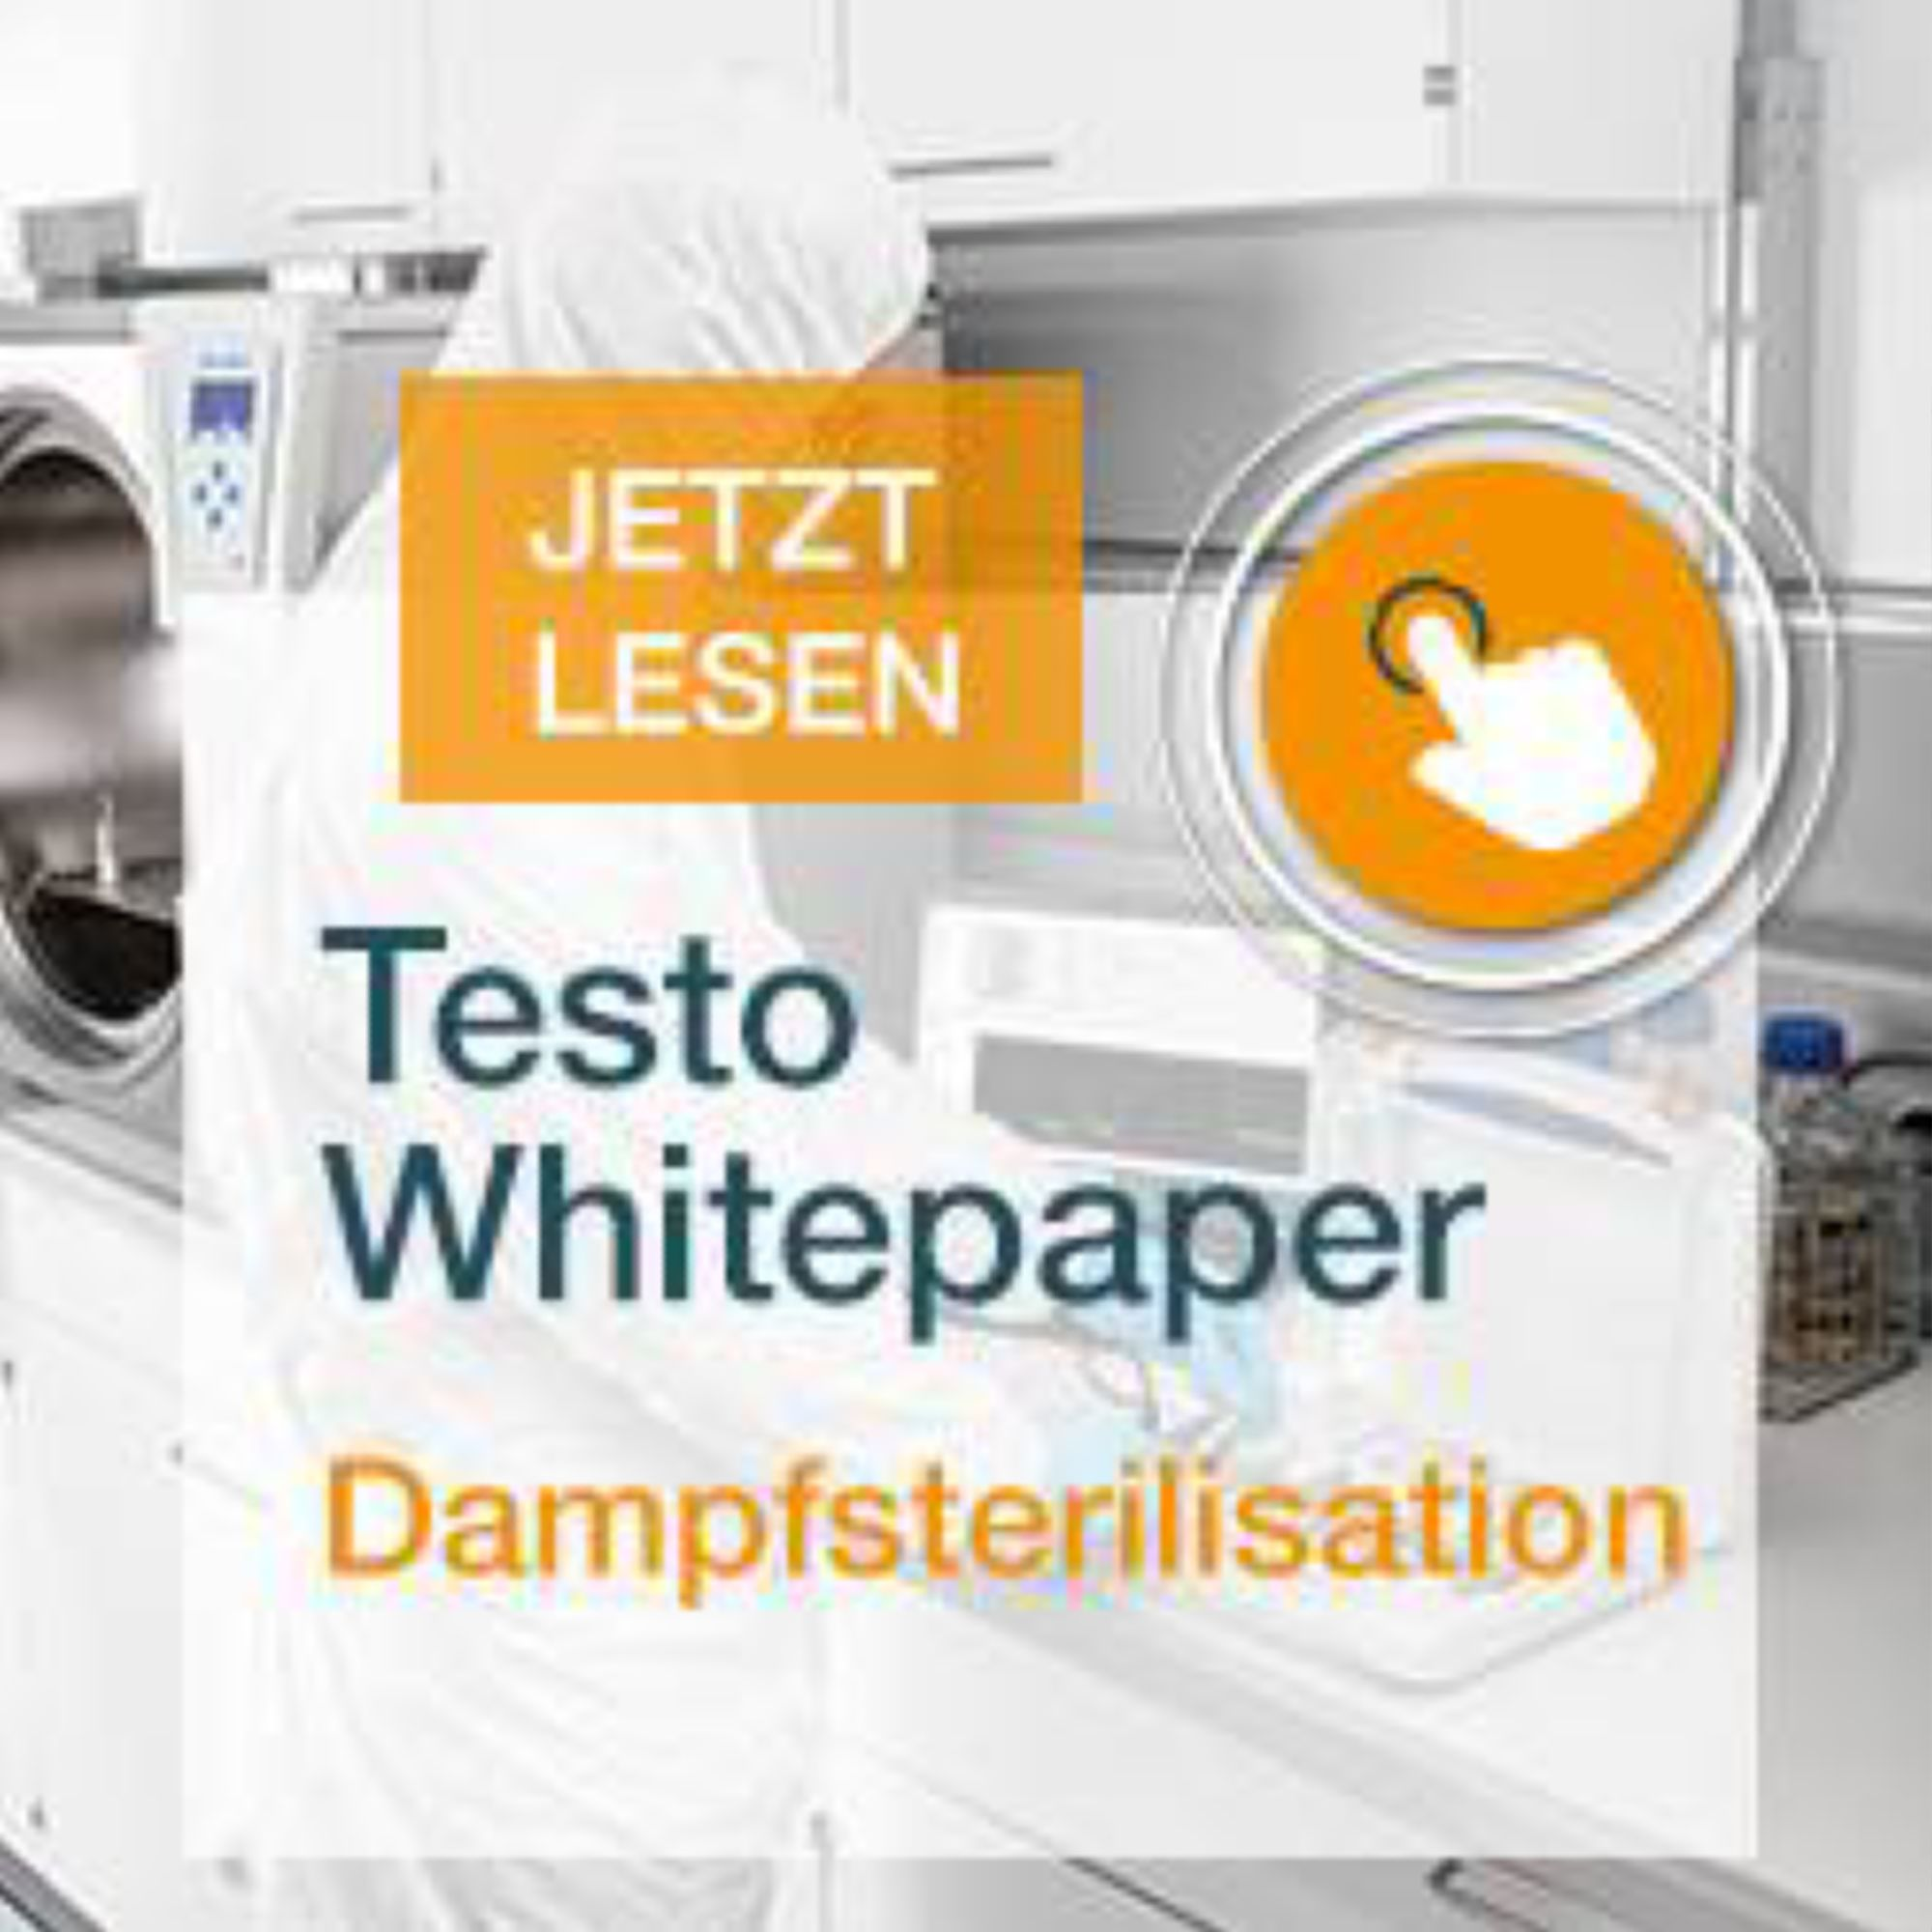 Flying-Teaser_250x250px_Whitepaper_Dampfsterilisation.jpg